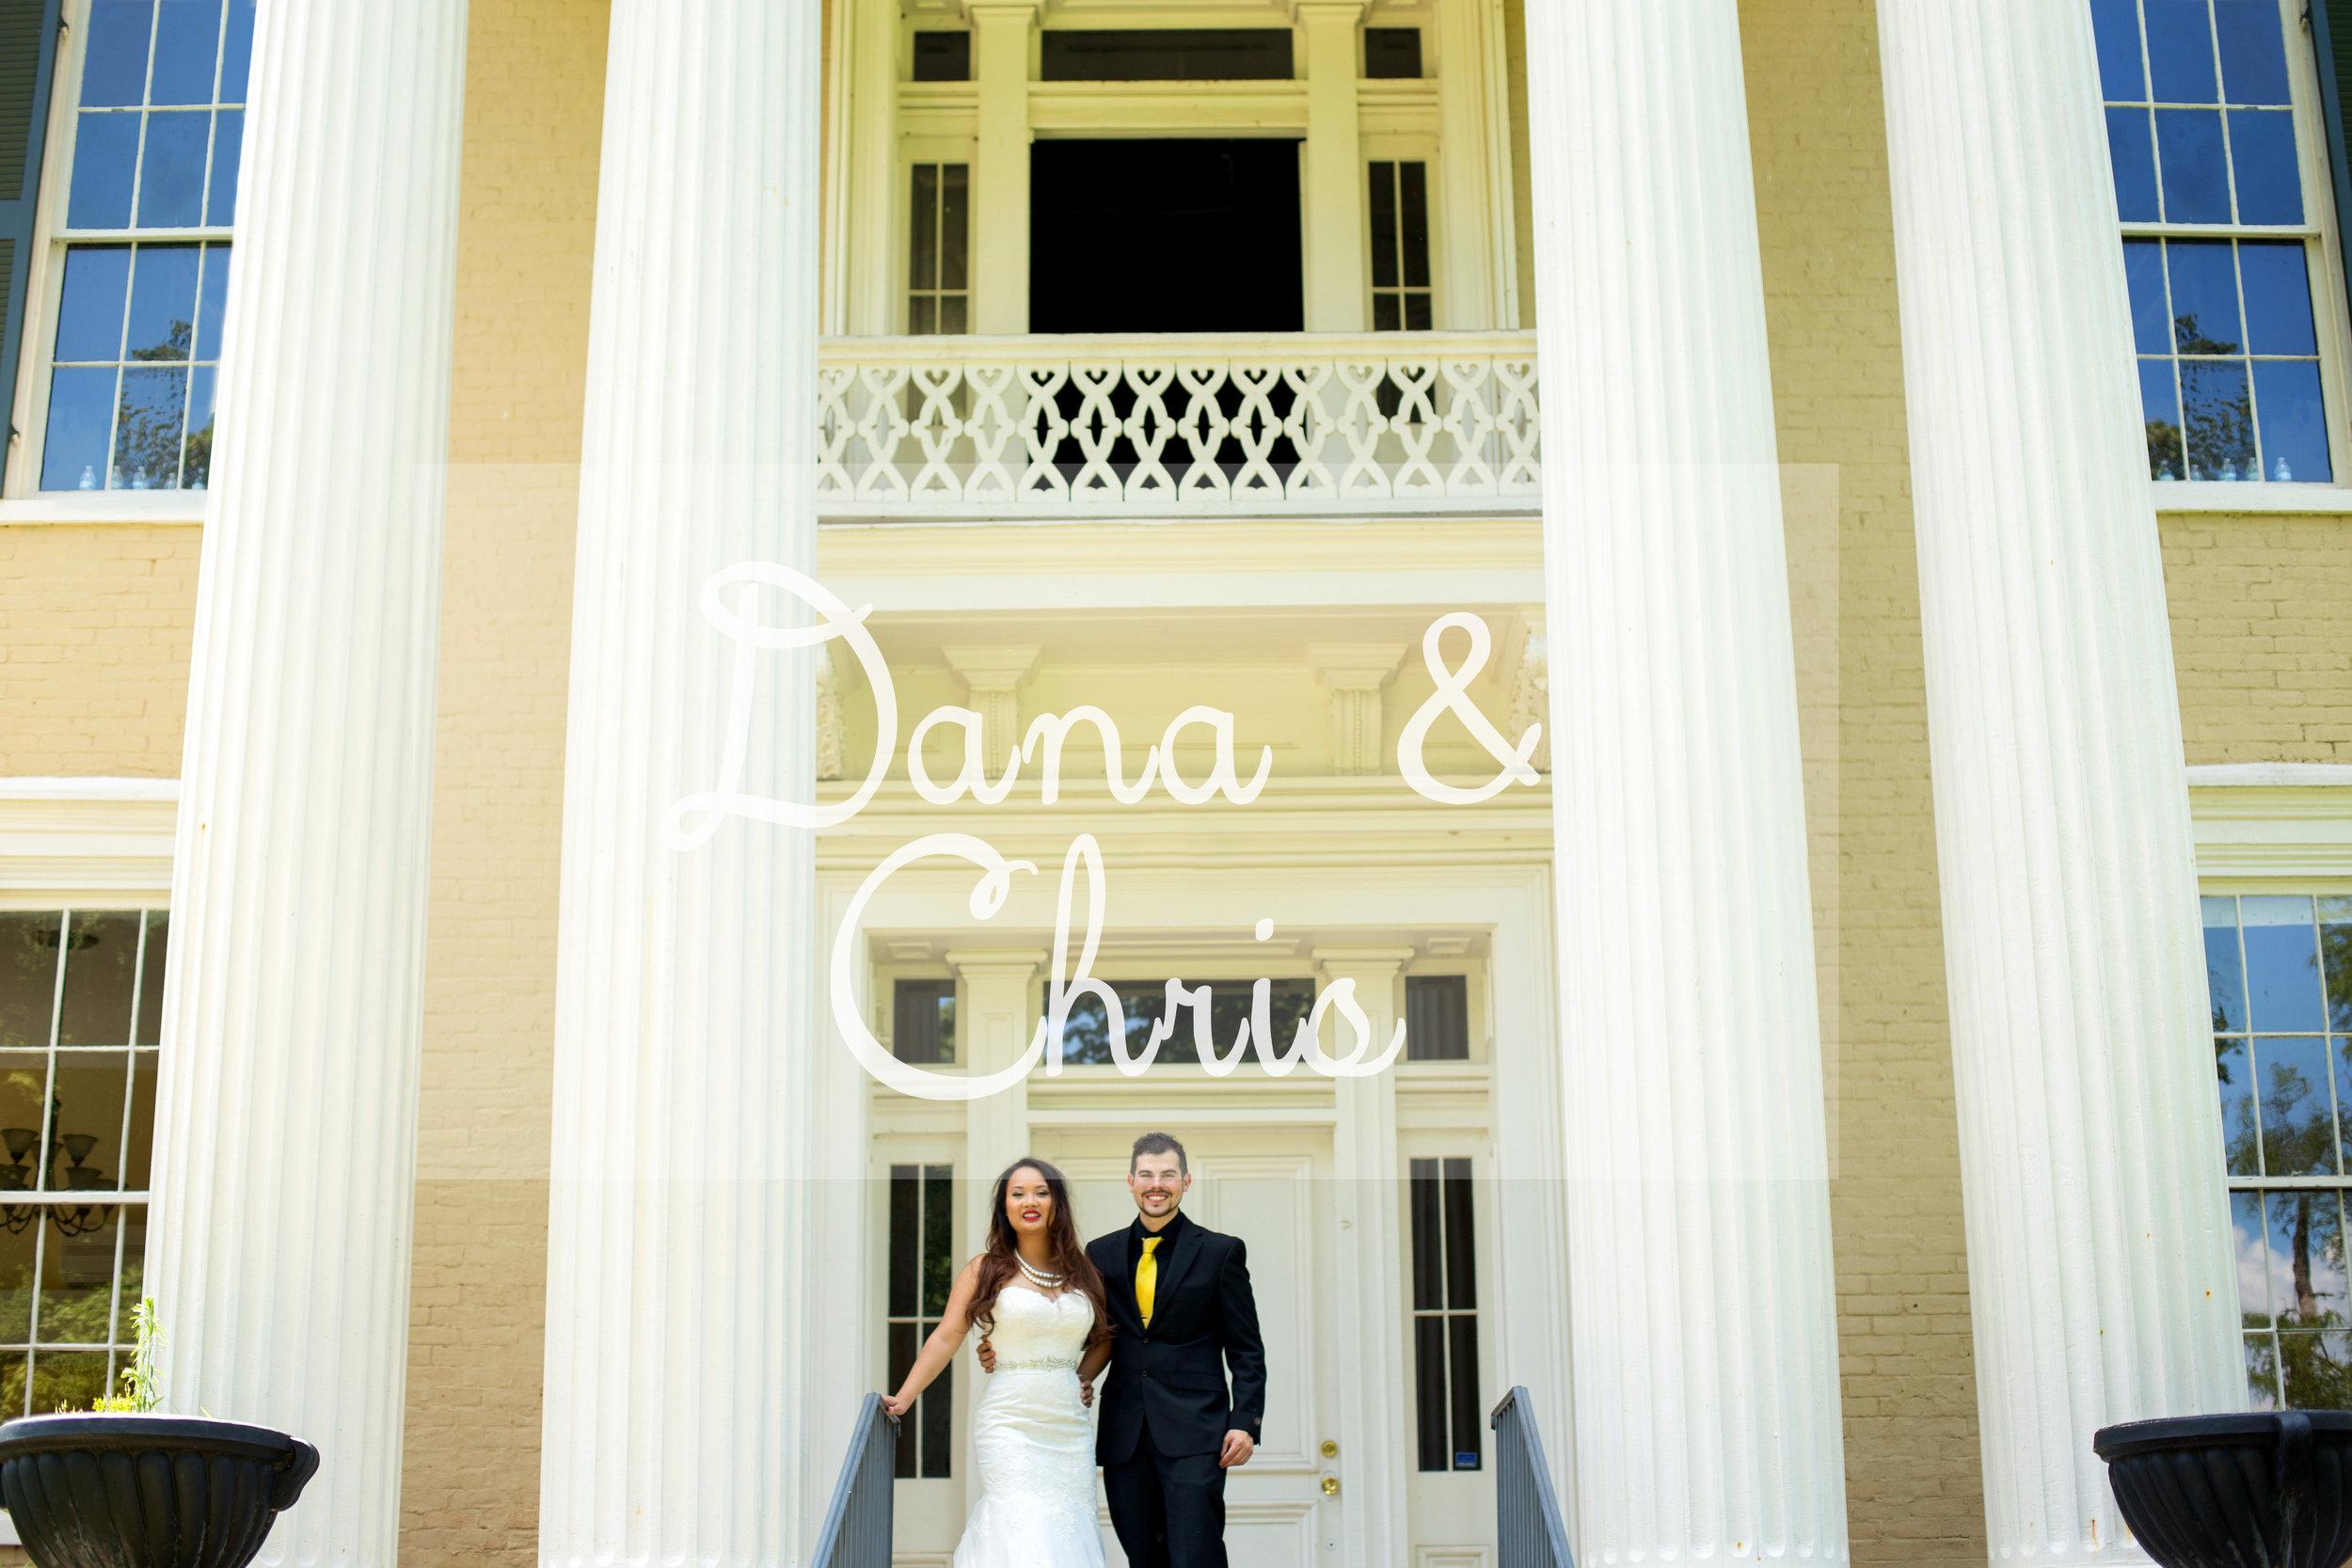 Dana & Chris Wedding - Together - Chelsea Meadows Photograph (12).jpg